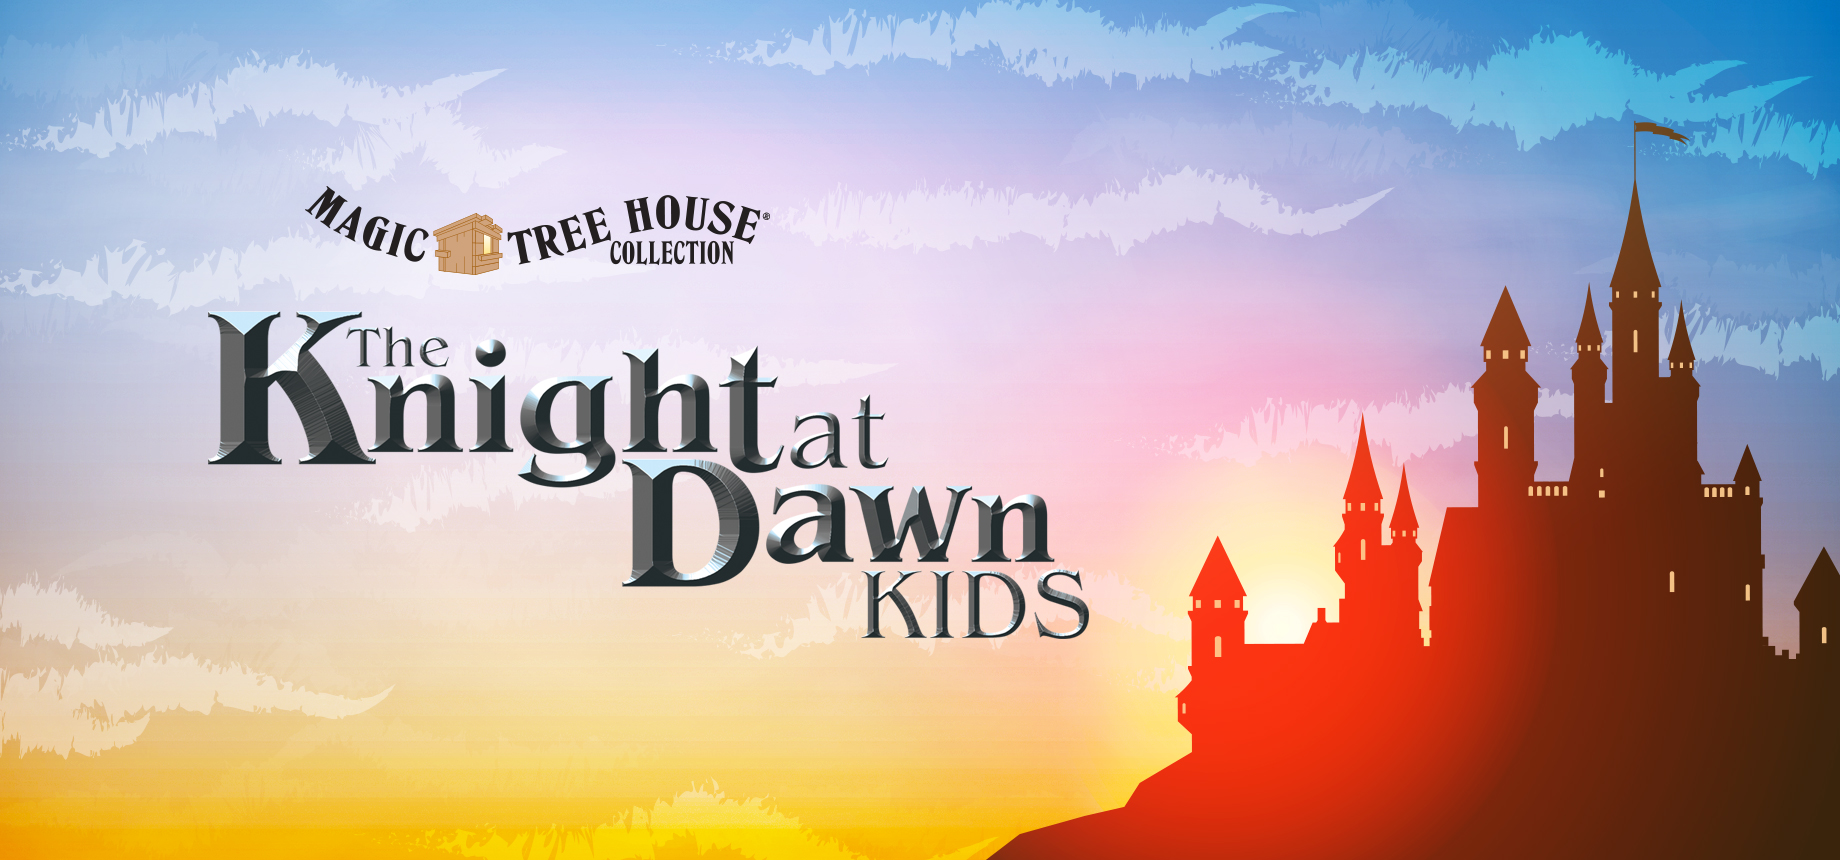 Magic Tree House The Knight At Dawn Kids